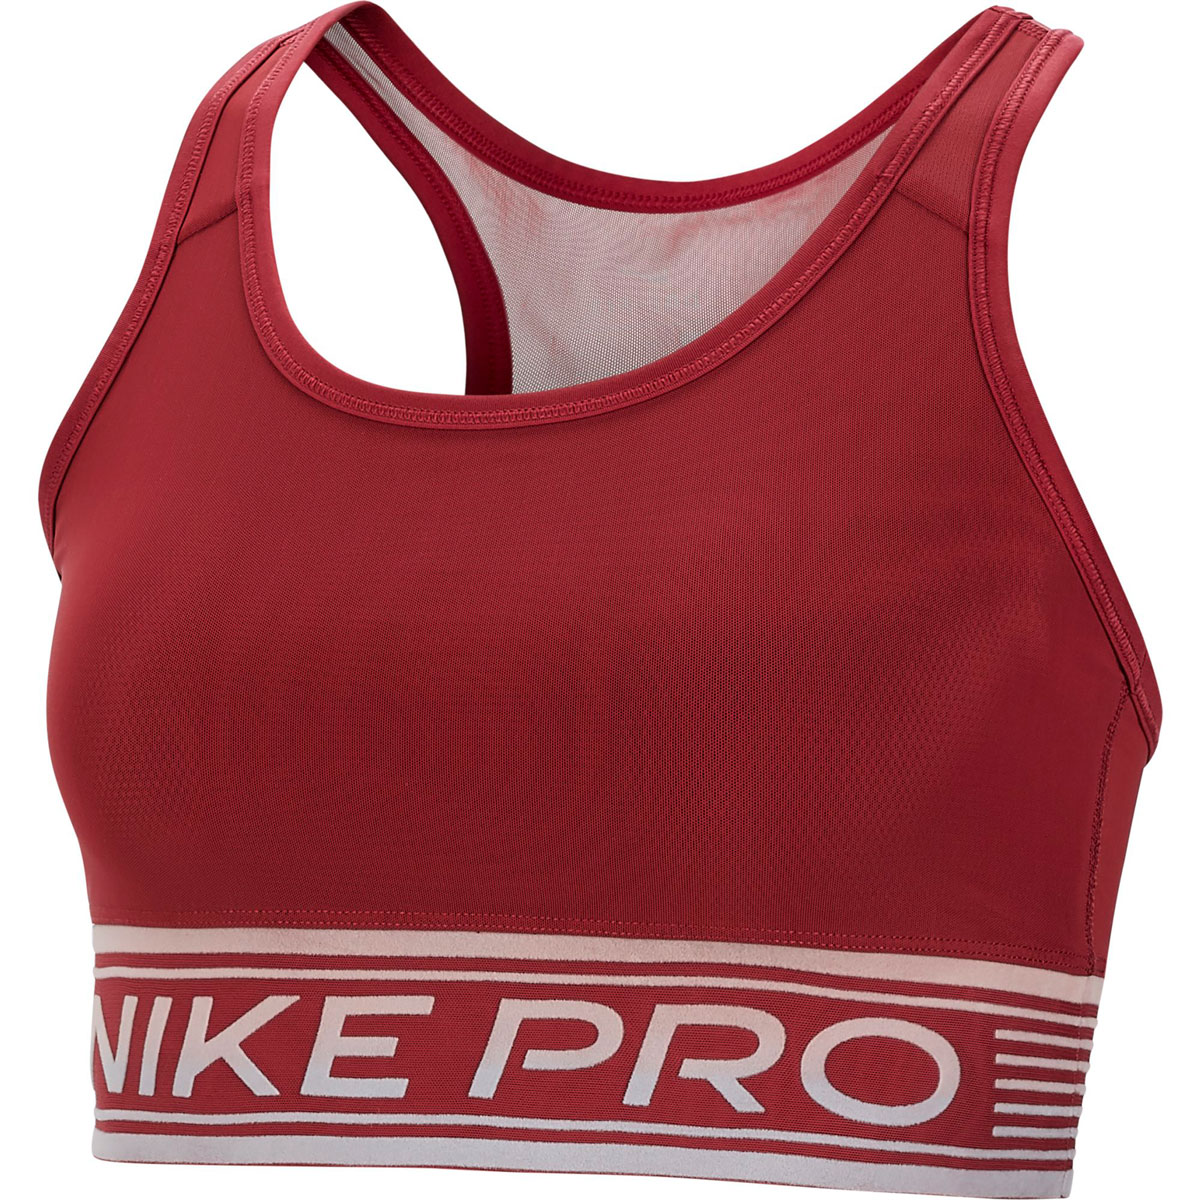 Women's Pro Pad Mesh Swoosh Sports Bra, Dk Red,Wine,Ruby,Burgandy, swatch